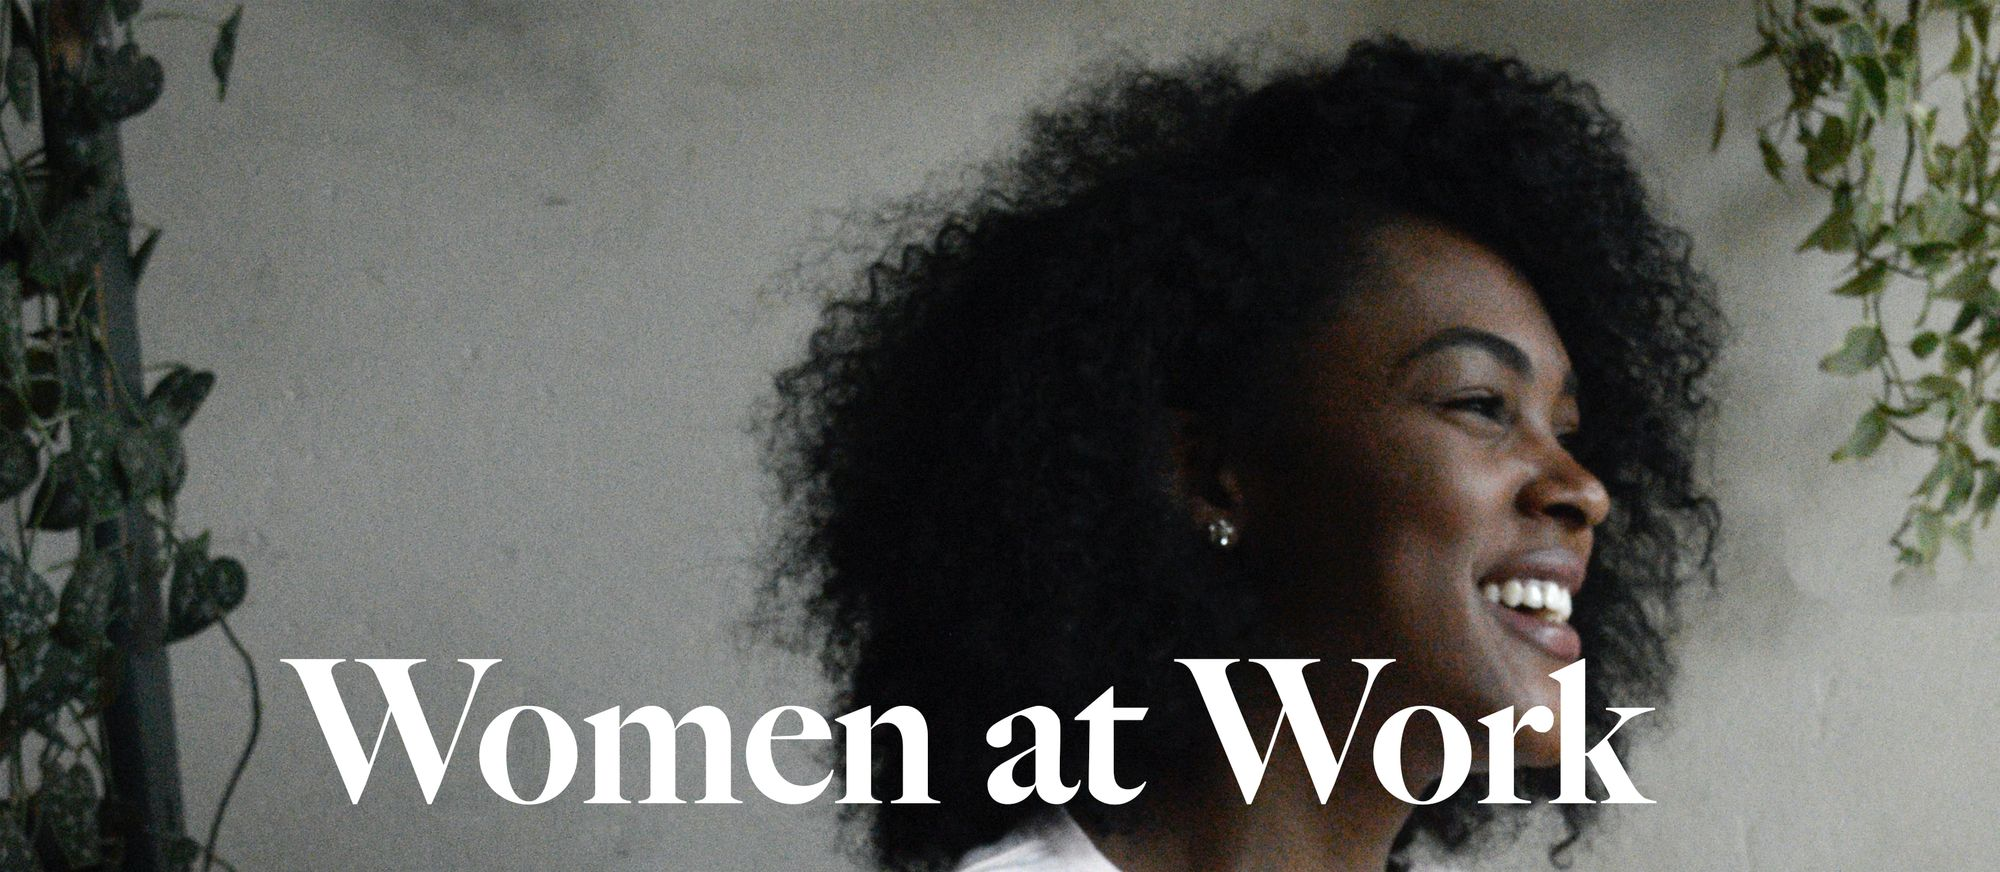 Women at Work - Edition 5